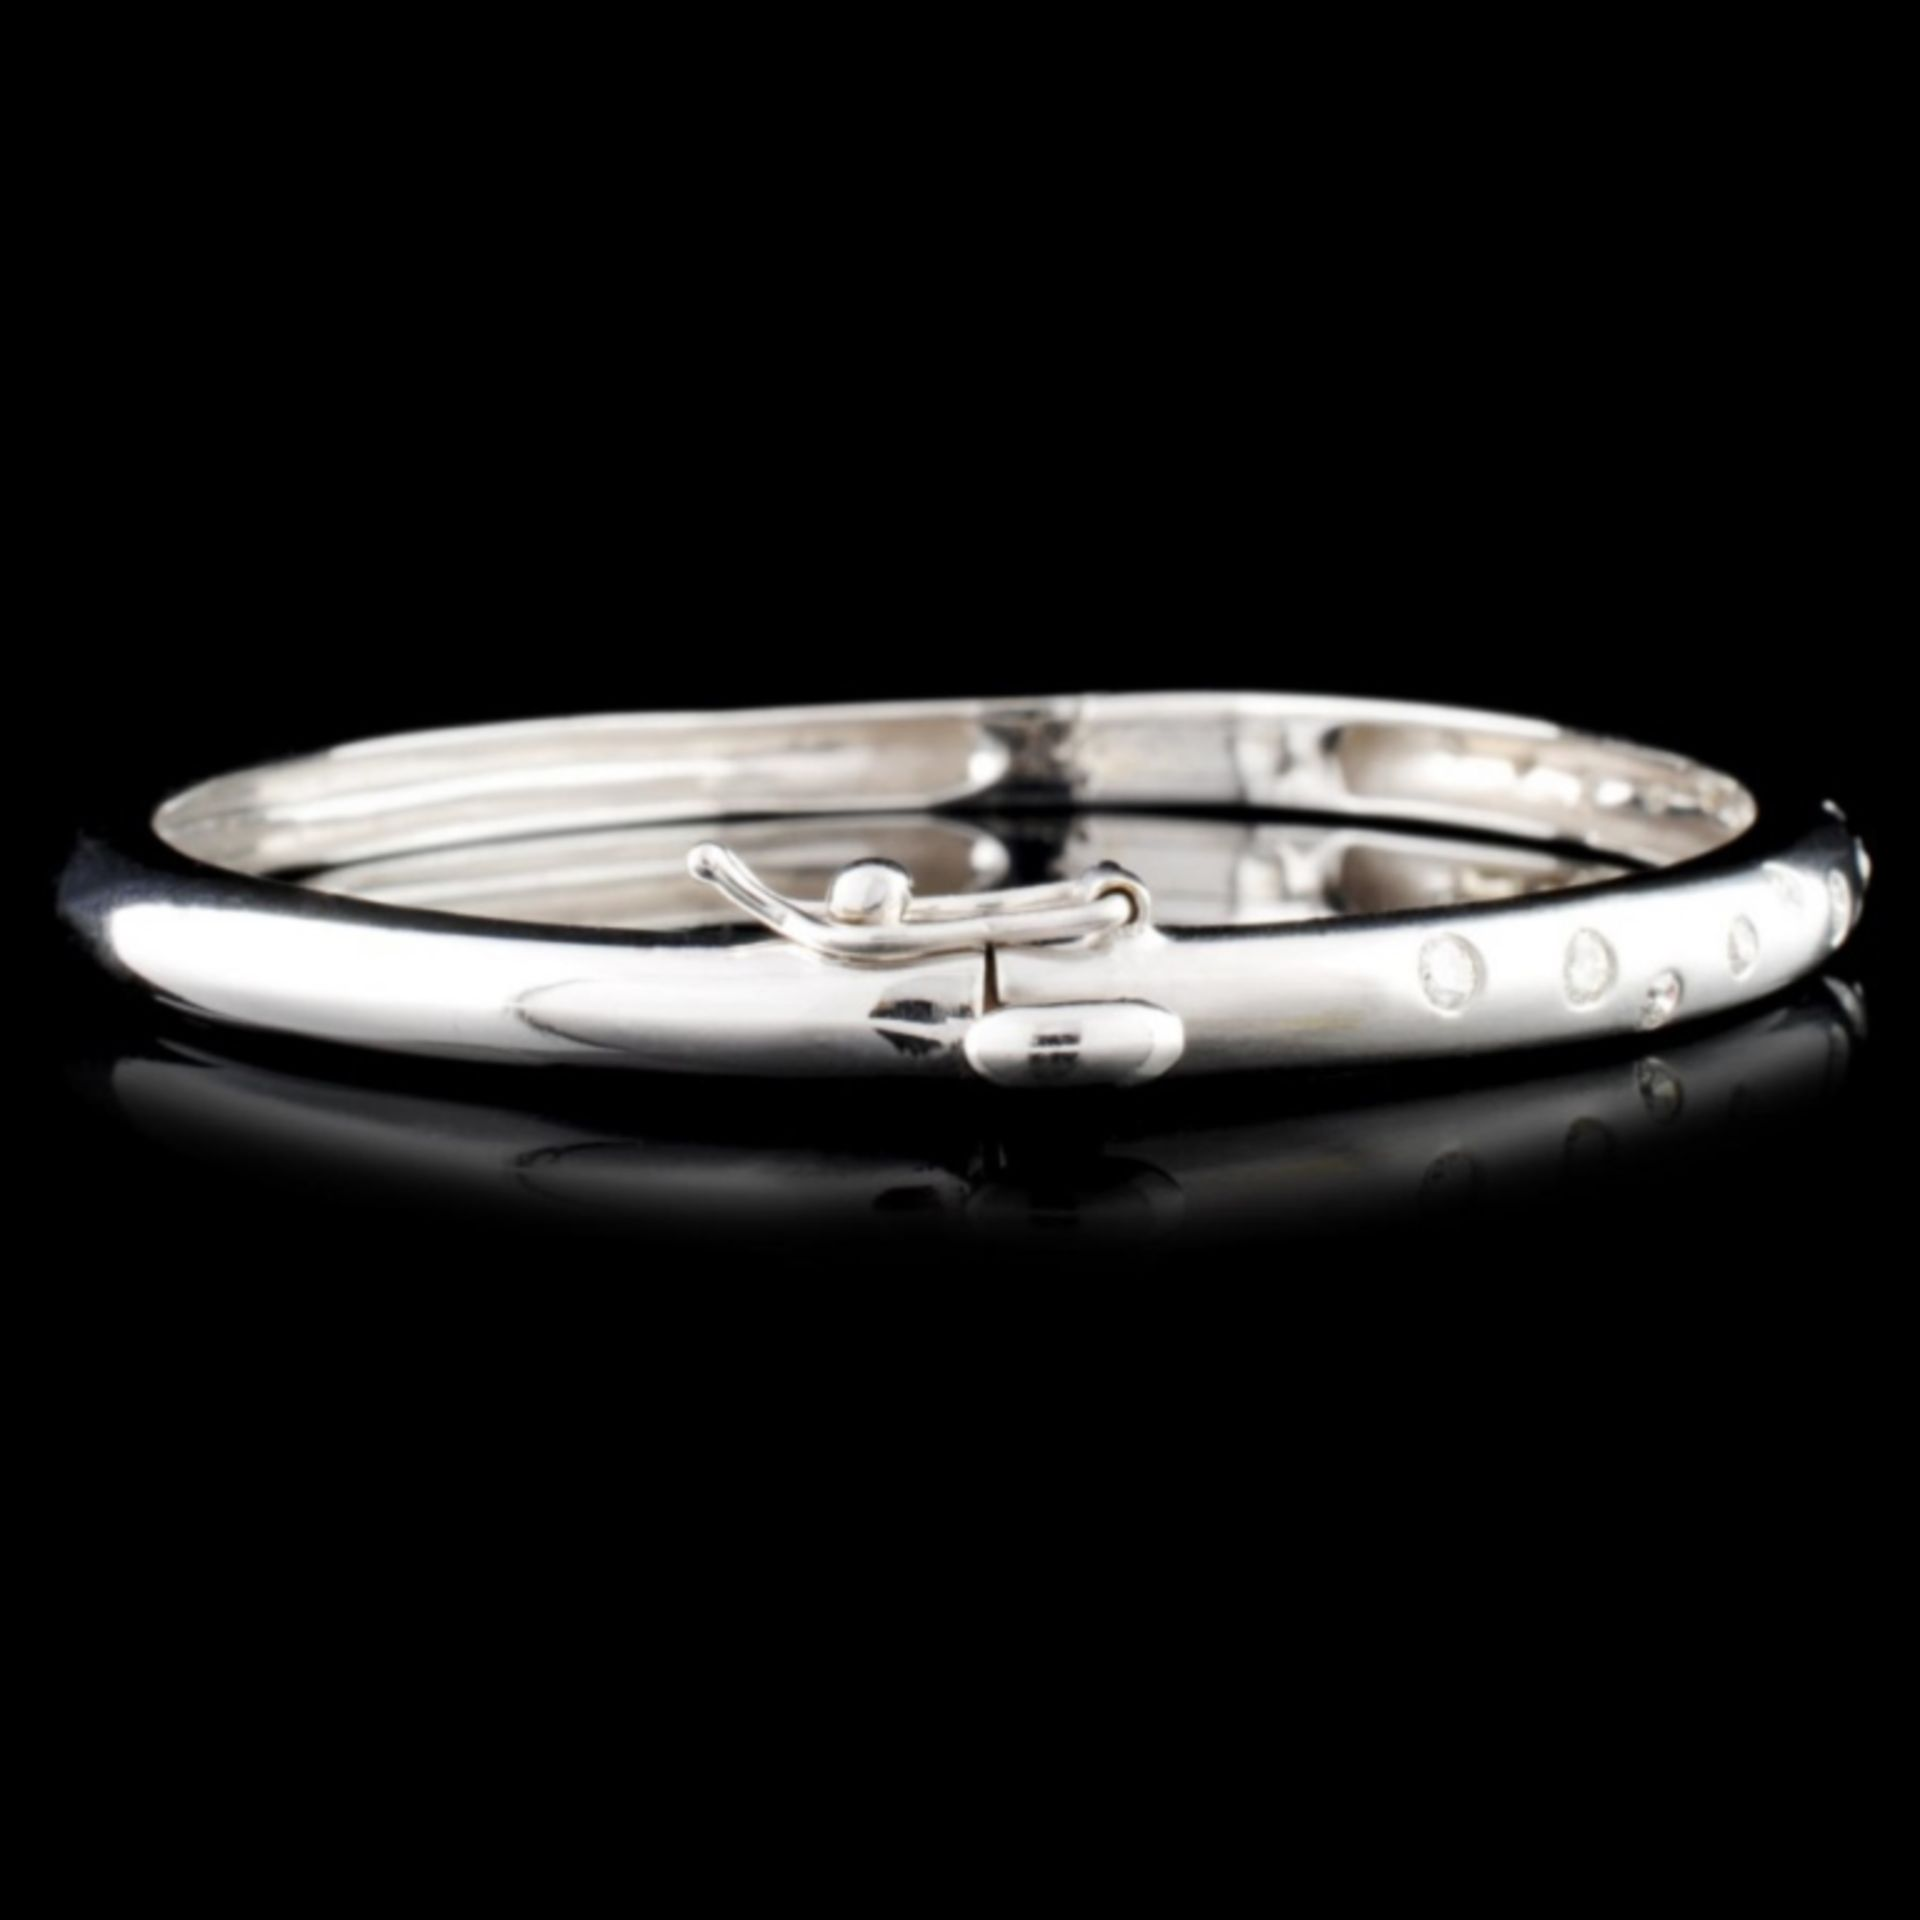 14K Gold 0.58ctw Diamond Bracelet - Image 2 of 3